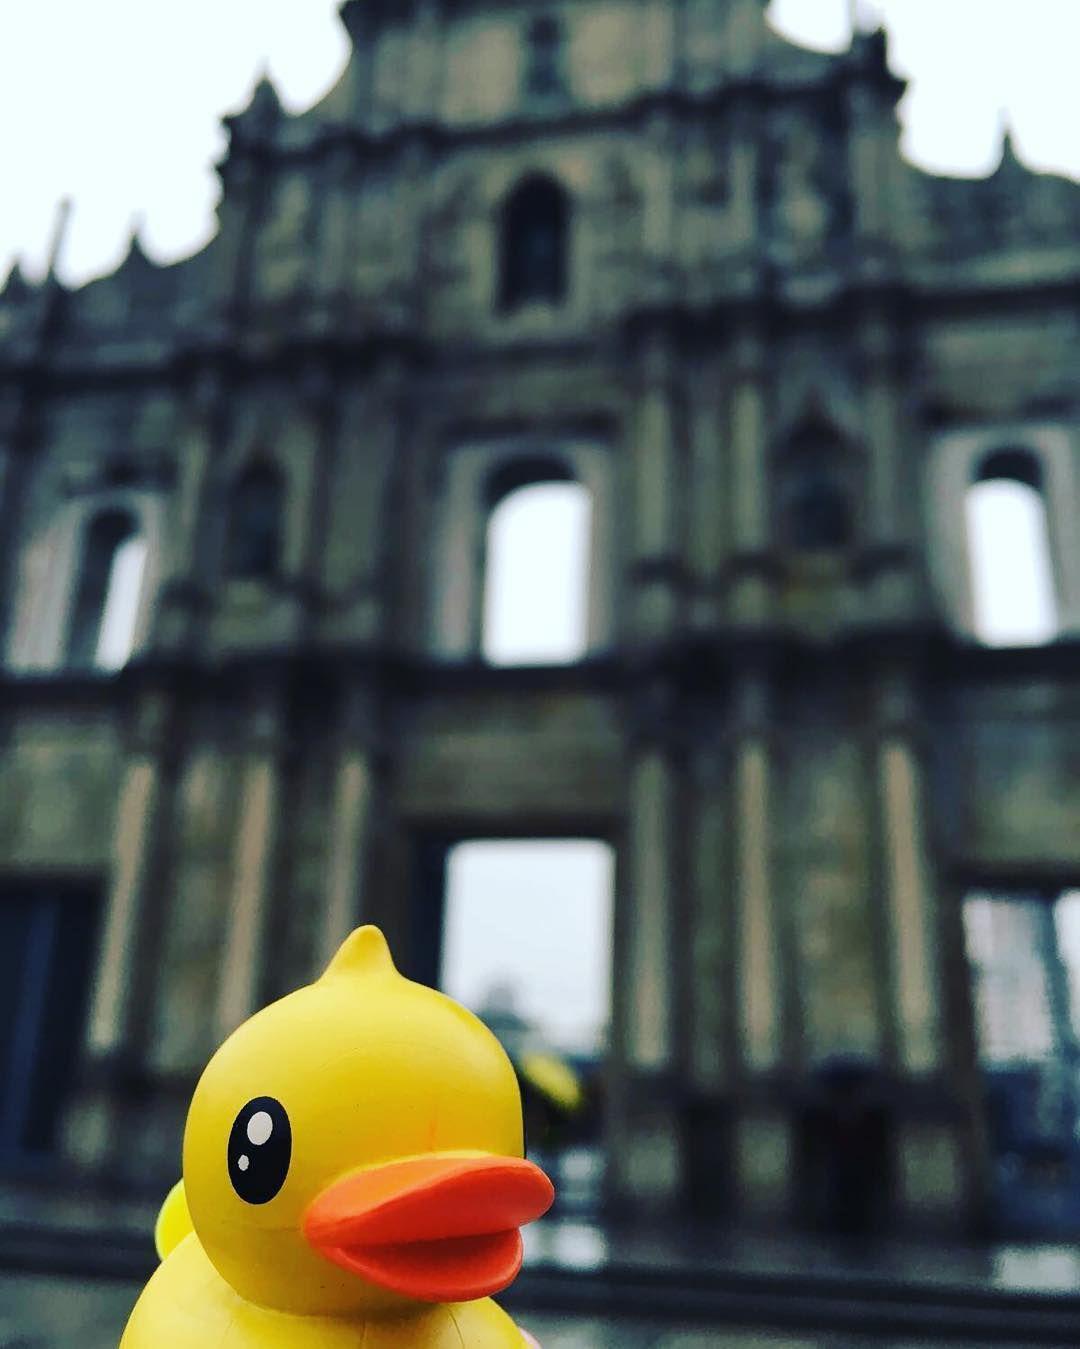 #duck#ducky#duckie#duckies#rubber#rubberduck#rubberducks#rubberducky#rubberduckies#rubberduckie#yellowduck#bathduck#เปด#Vịt#Canard#Pato#Ente#утка#Eend#鴨#アヒル#오리#kylpyankka#quack# by apolo1313